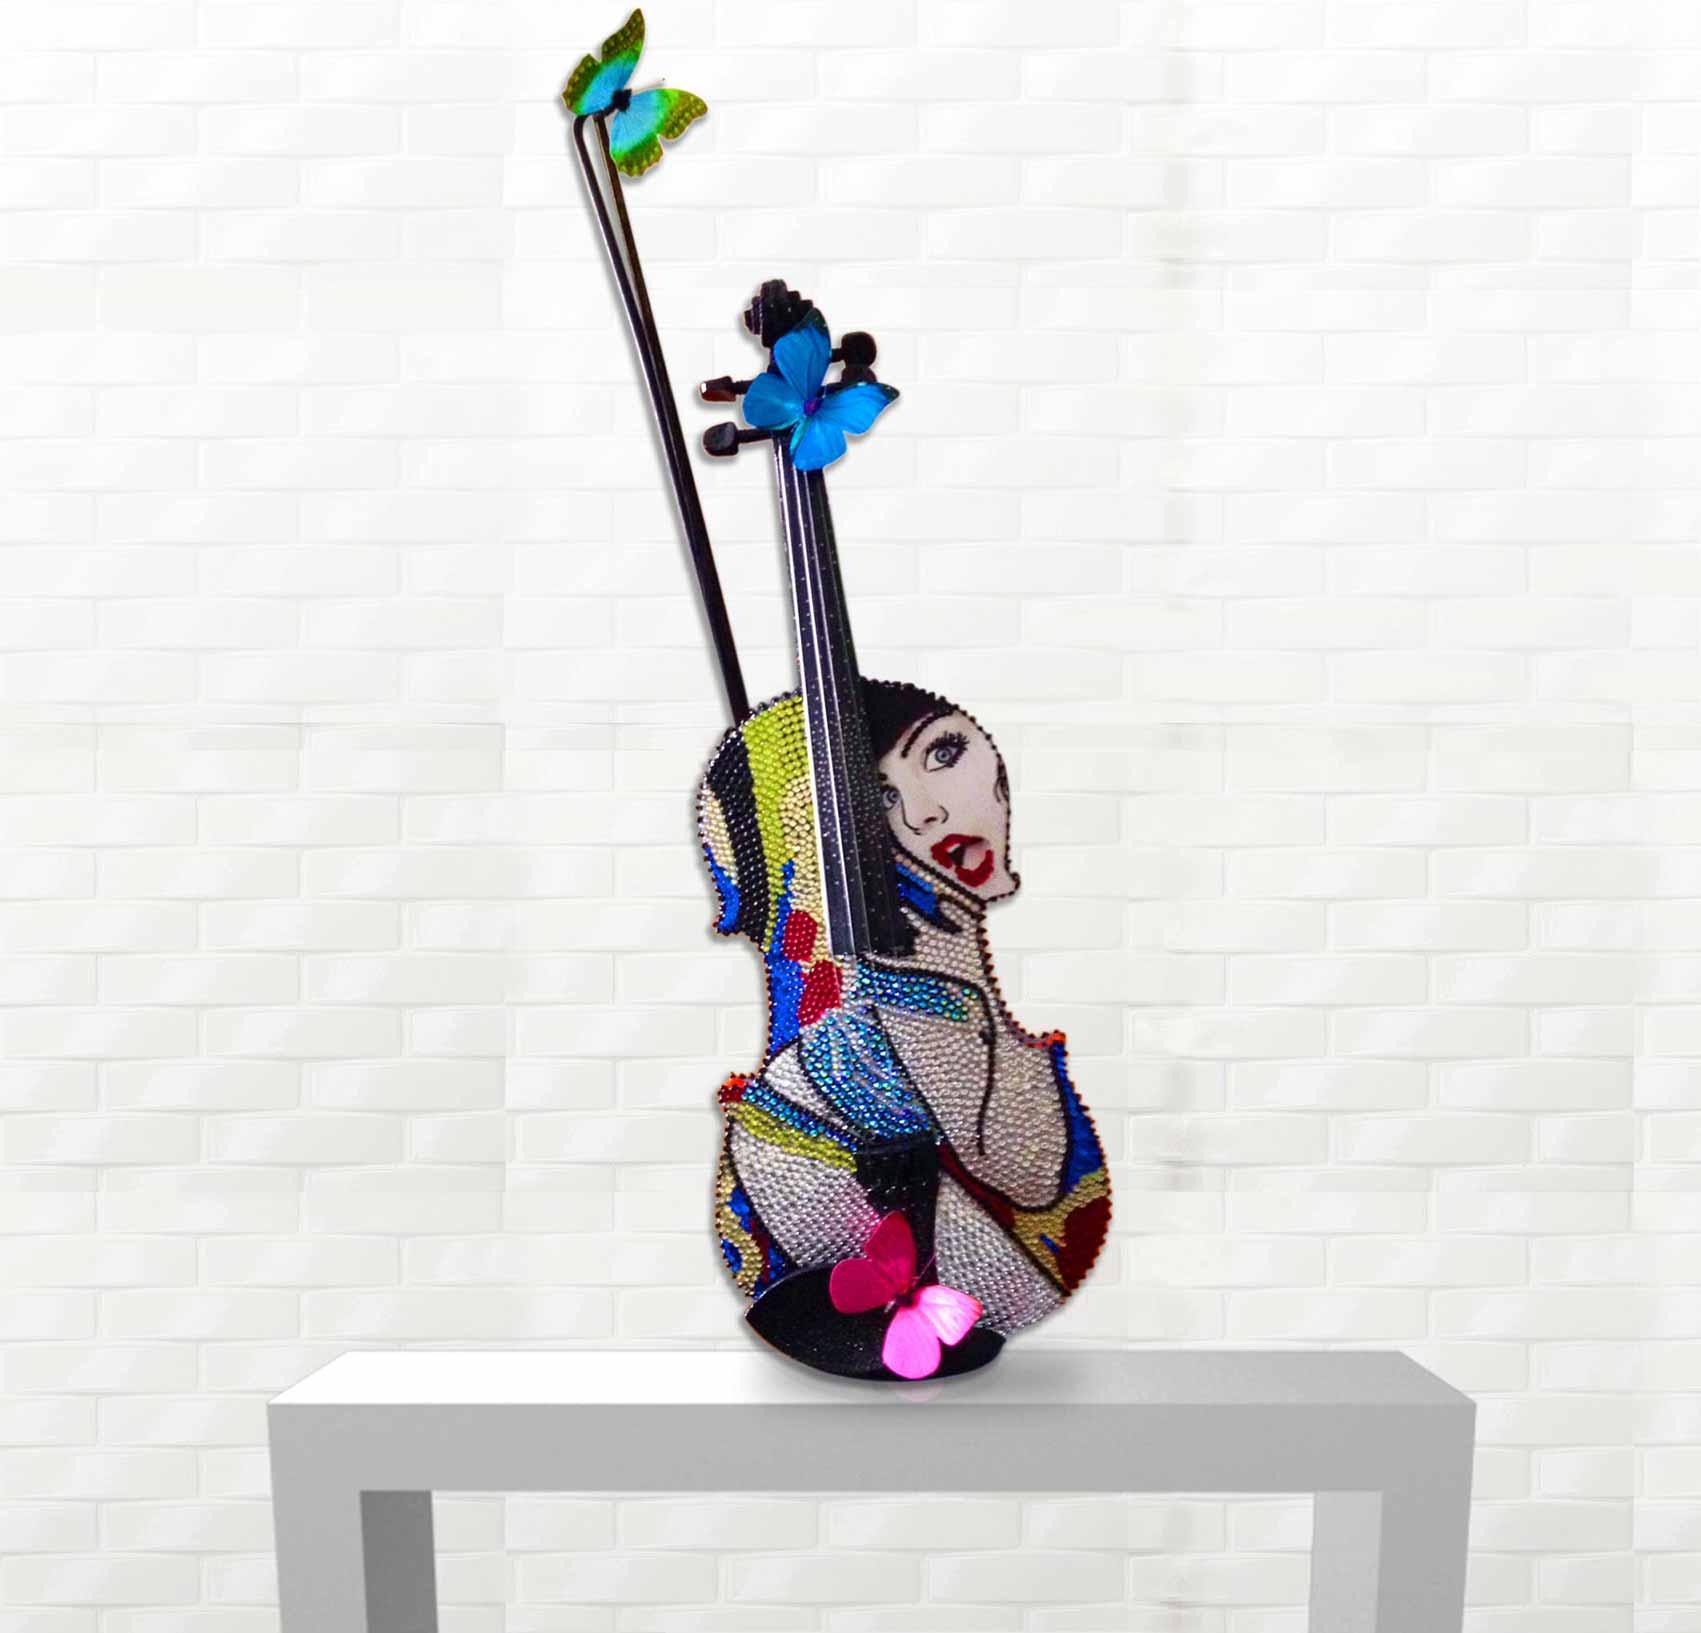 oeuvre, tableau, artiste, artiste peintre, contemporain, atelier , atelier pop art, decoration, galerie, sculpture